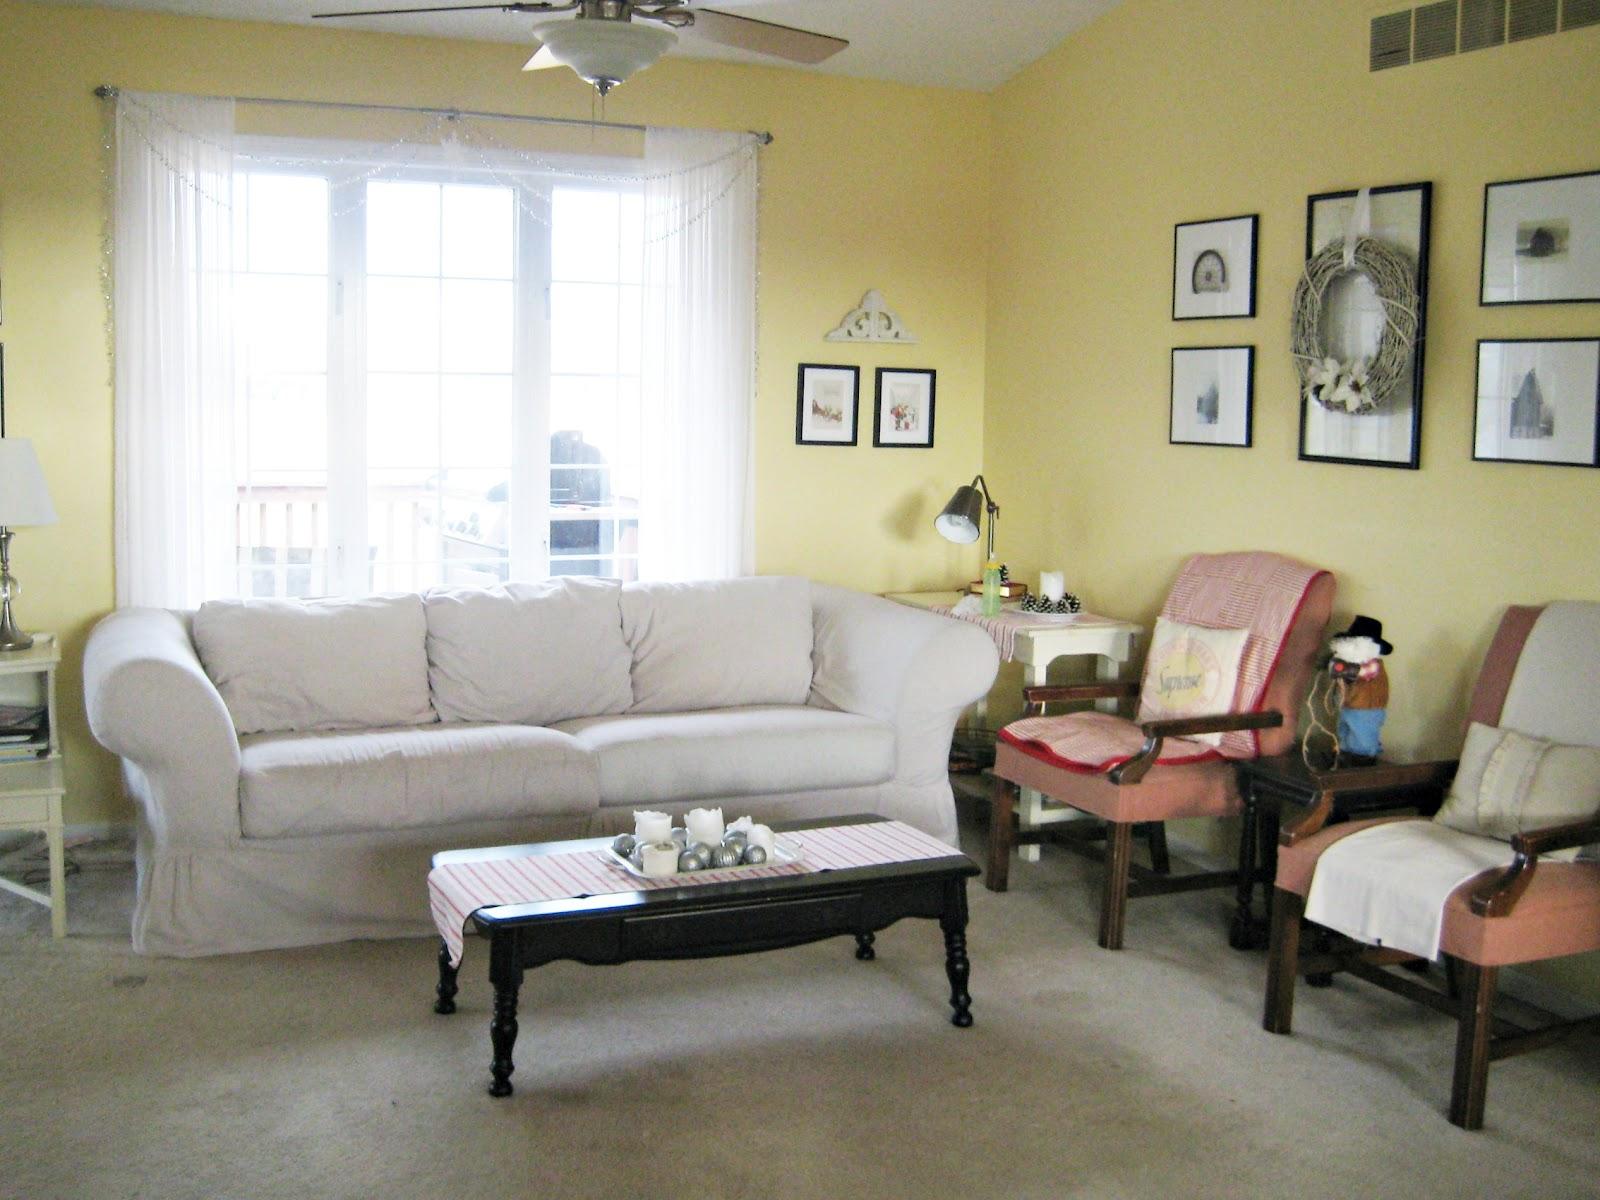 Home Depot Living Room Paint Ideas  Zion Star